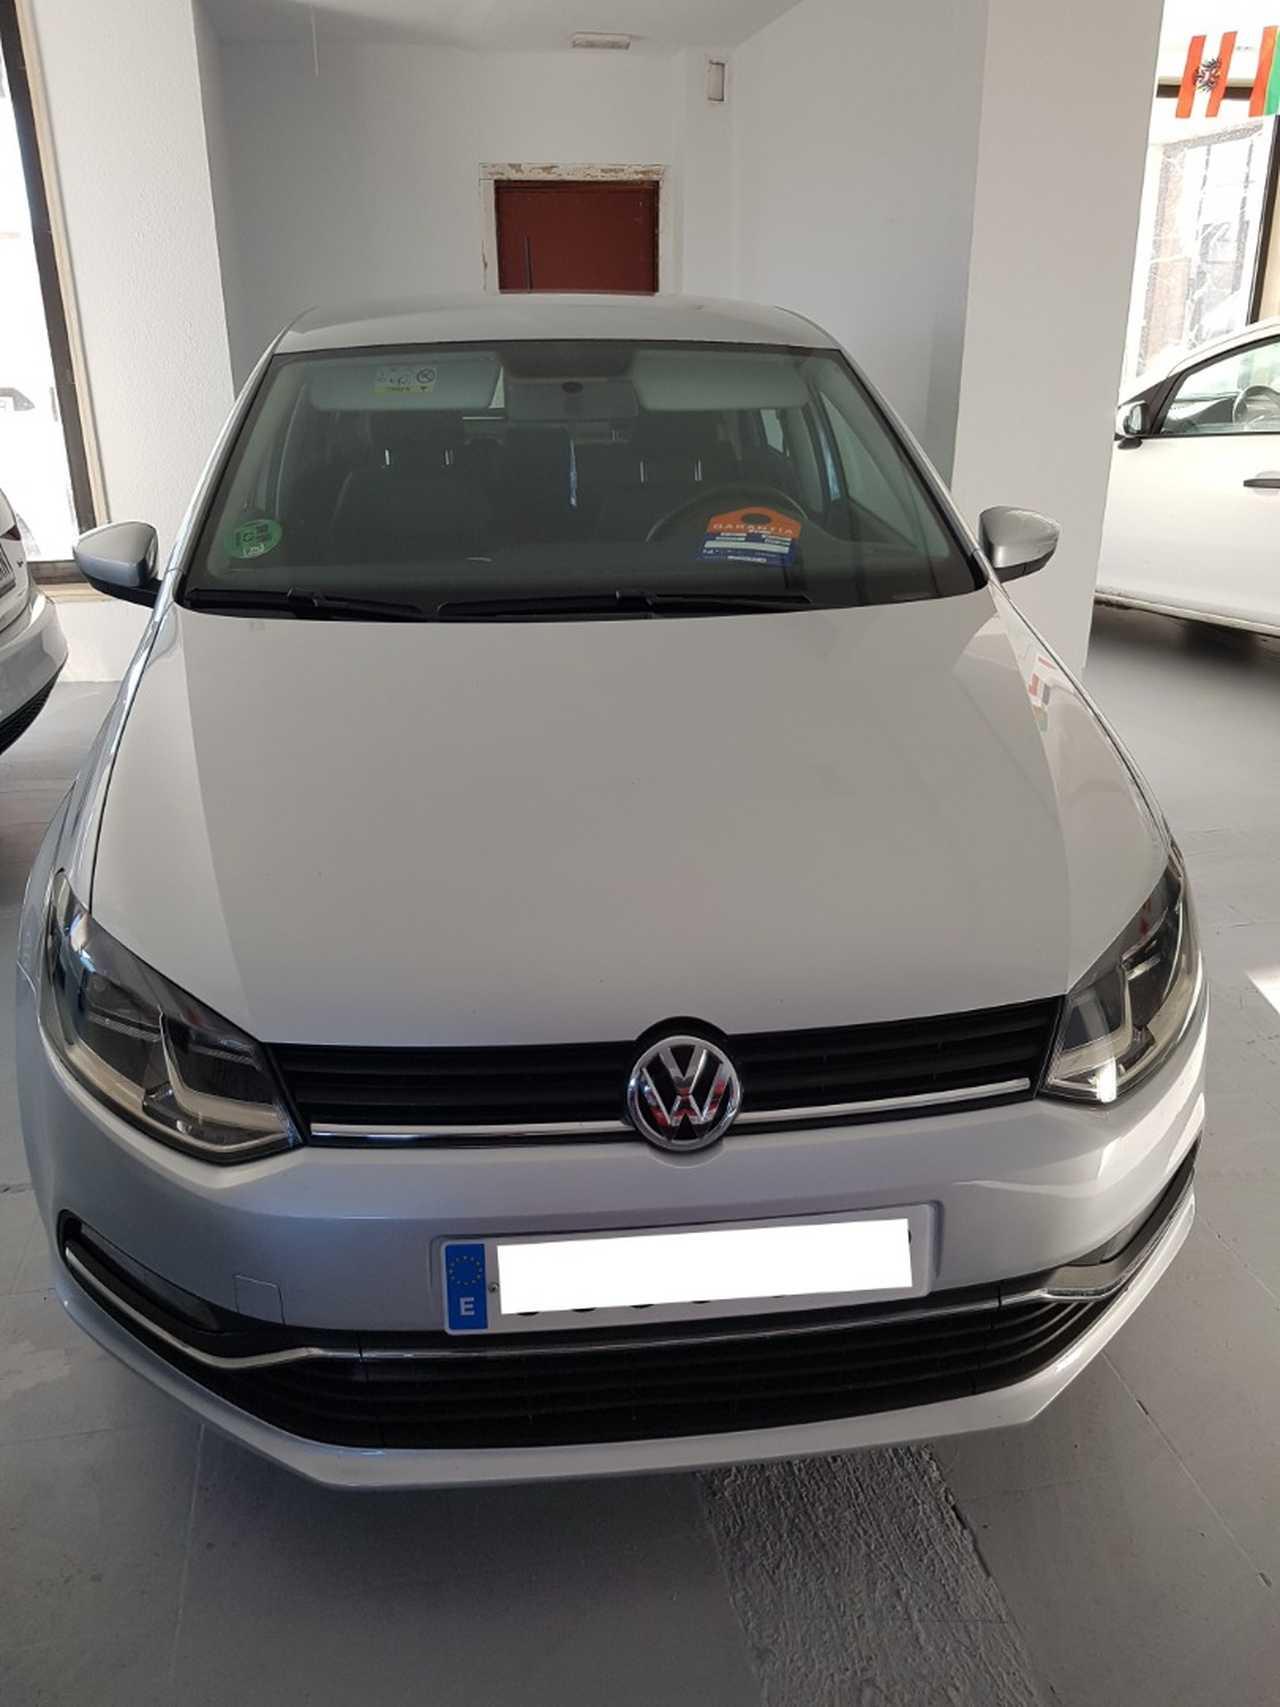 Volkswagen Polo 1.6tdi 90cv   - Foto 1